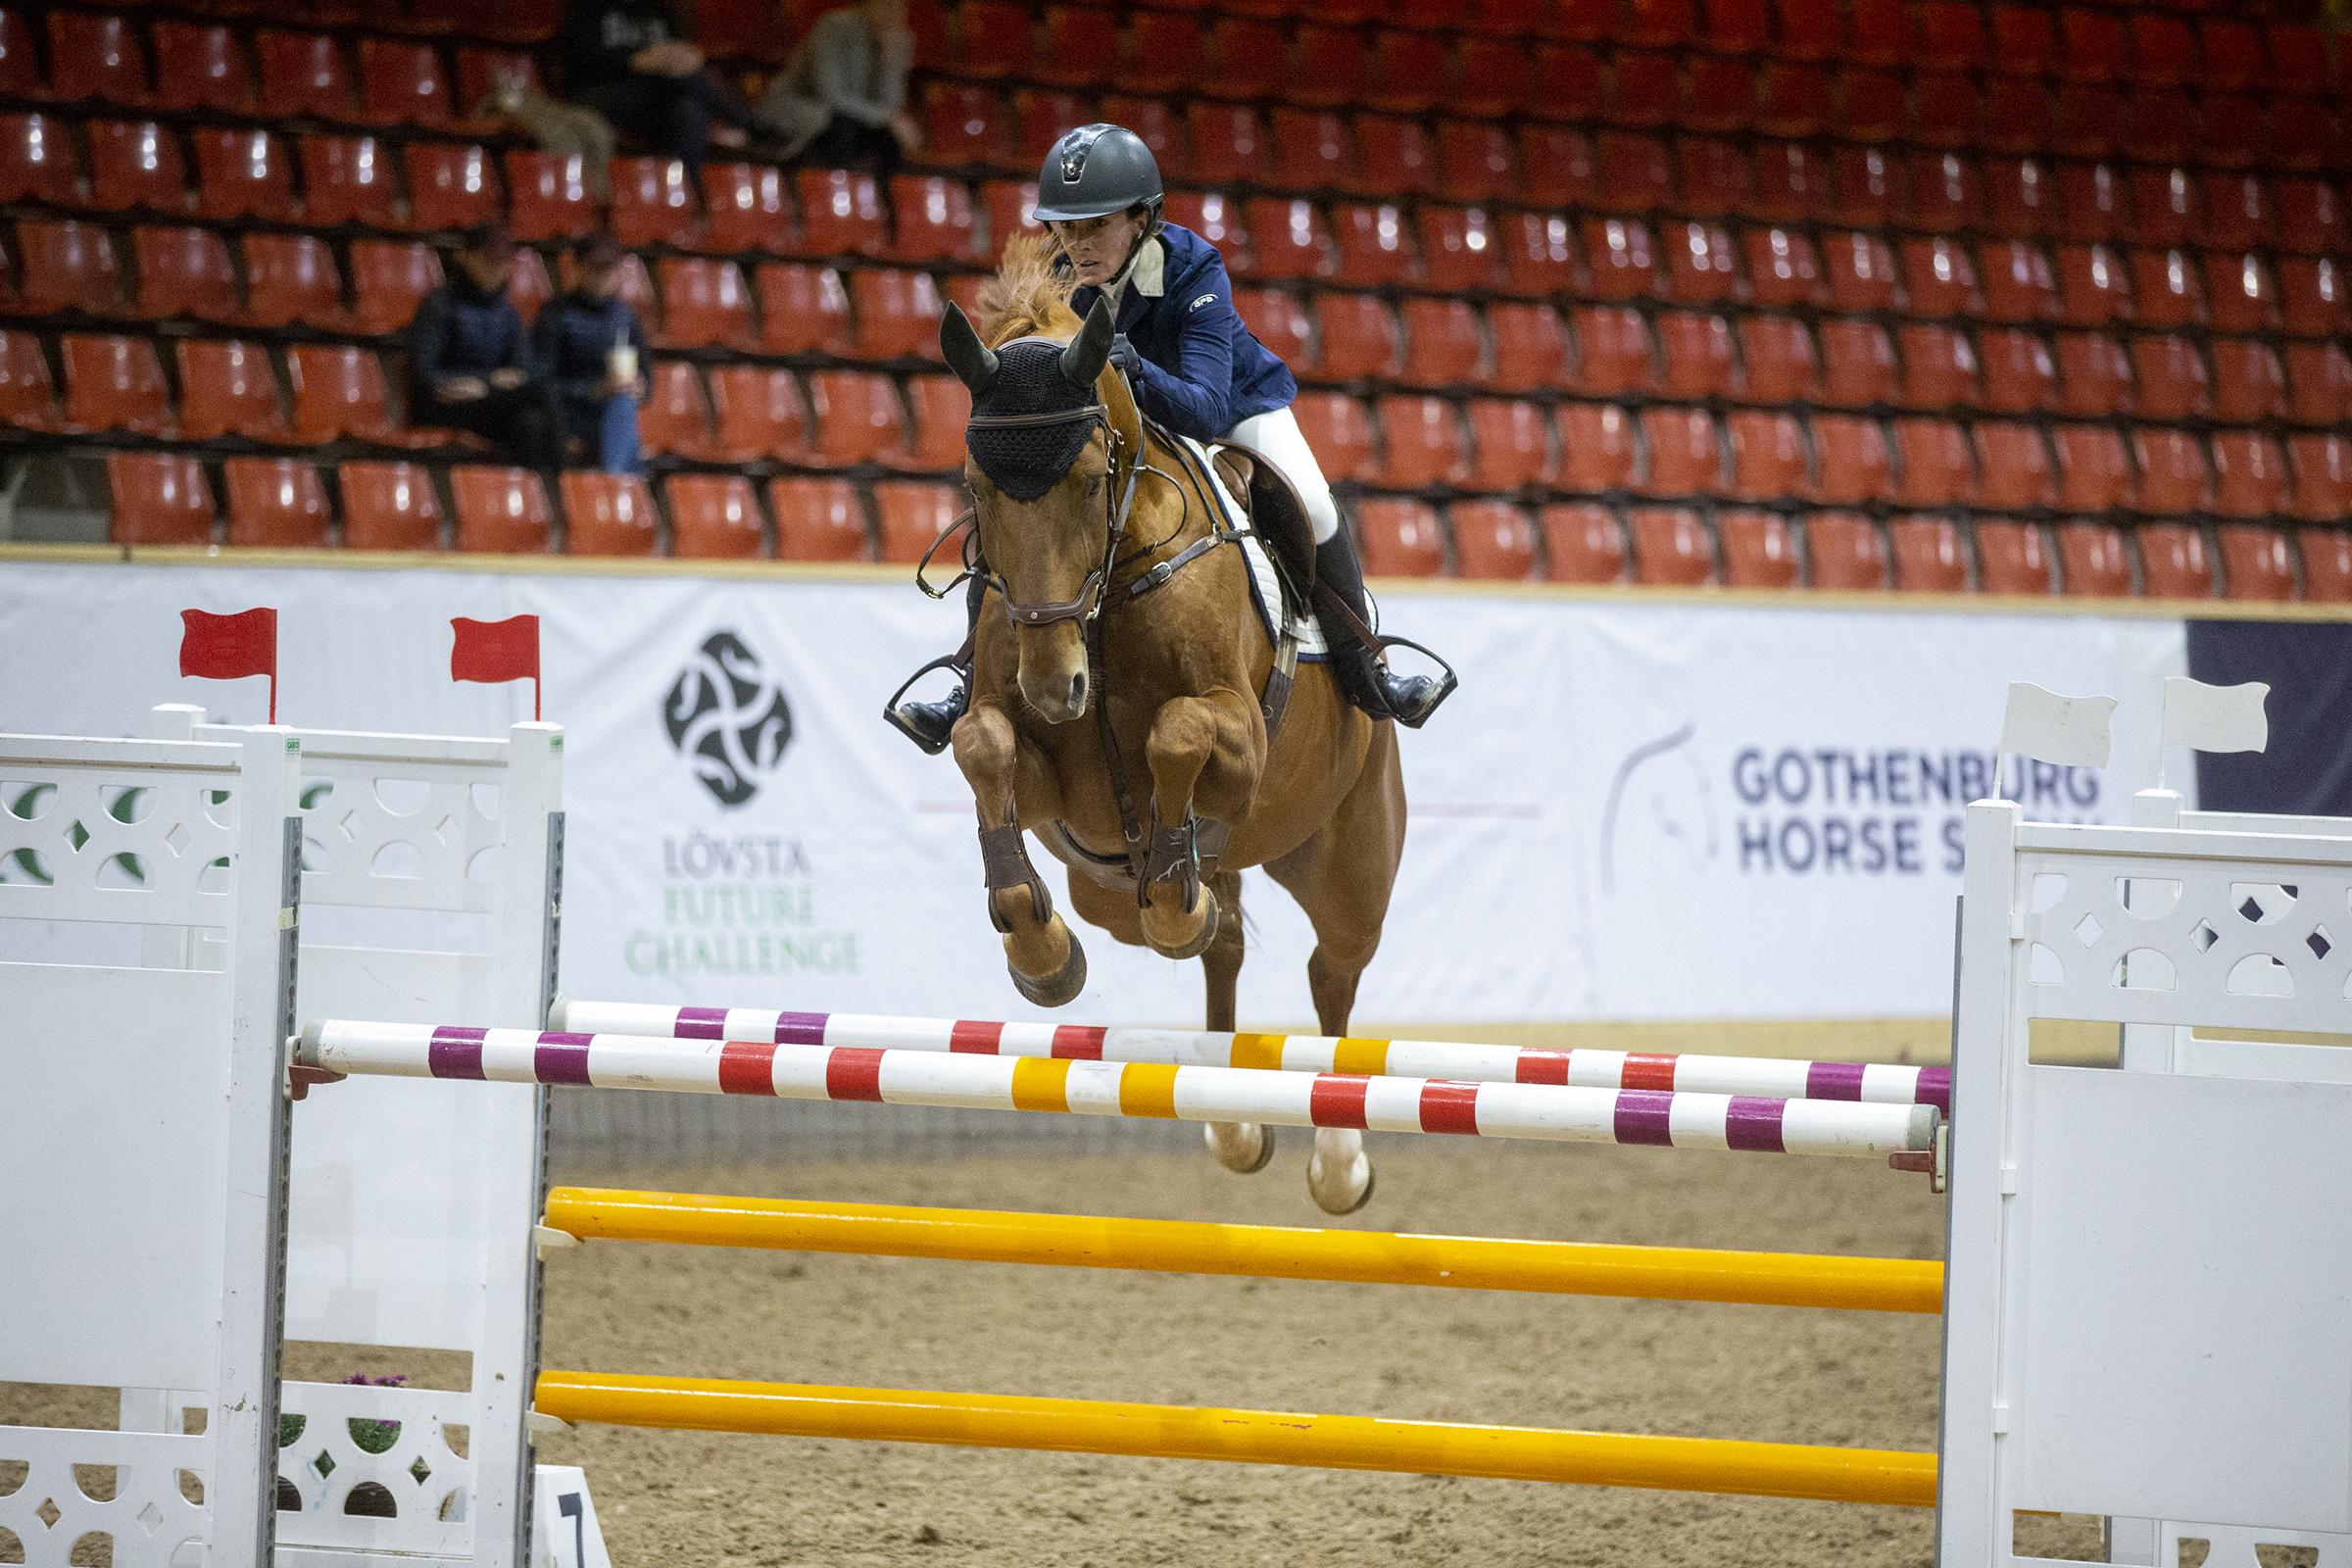 Elin Hultberg-lucky Code 1 211006 Rt